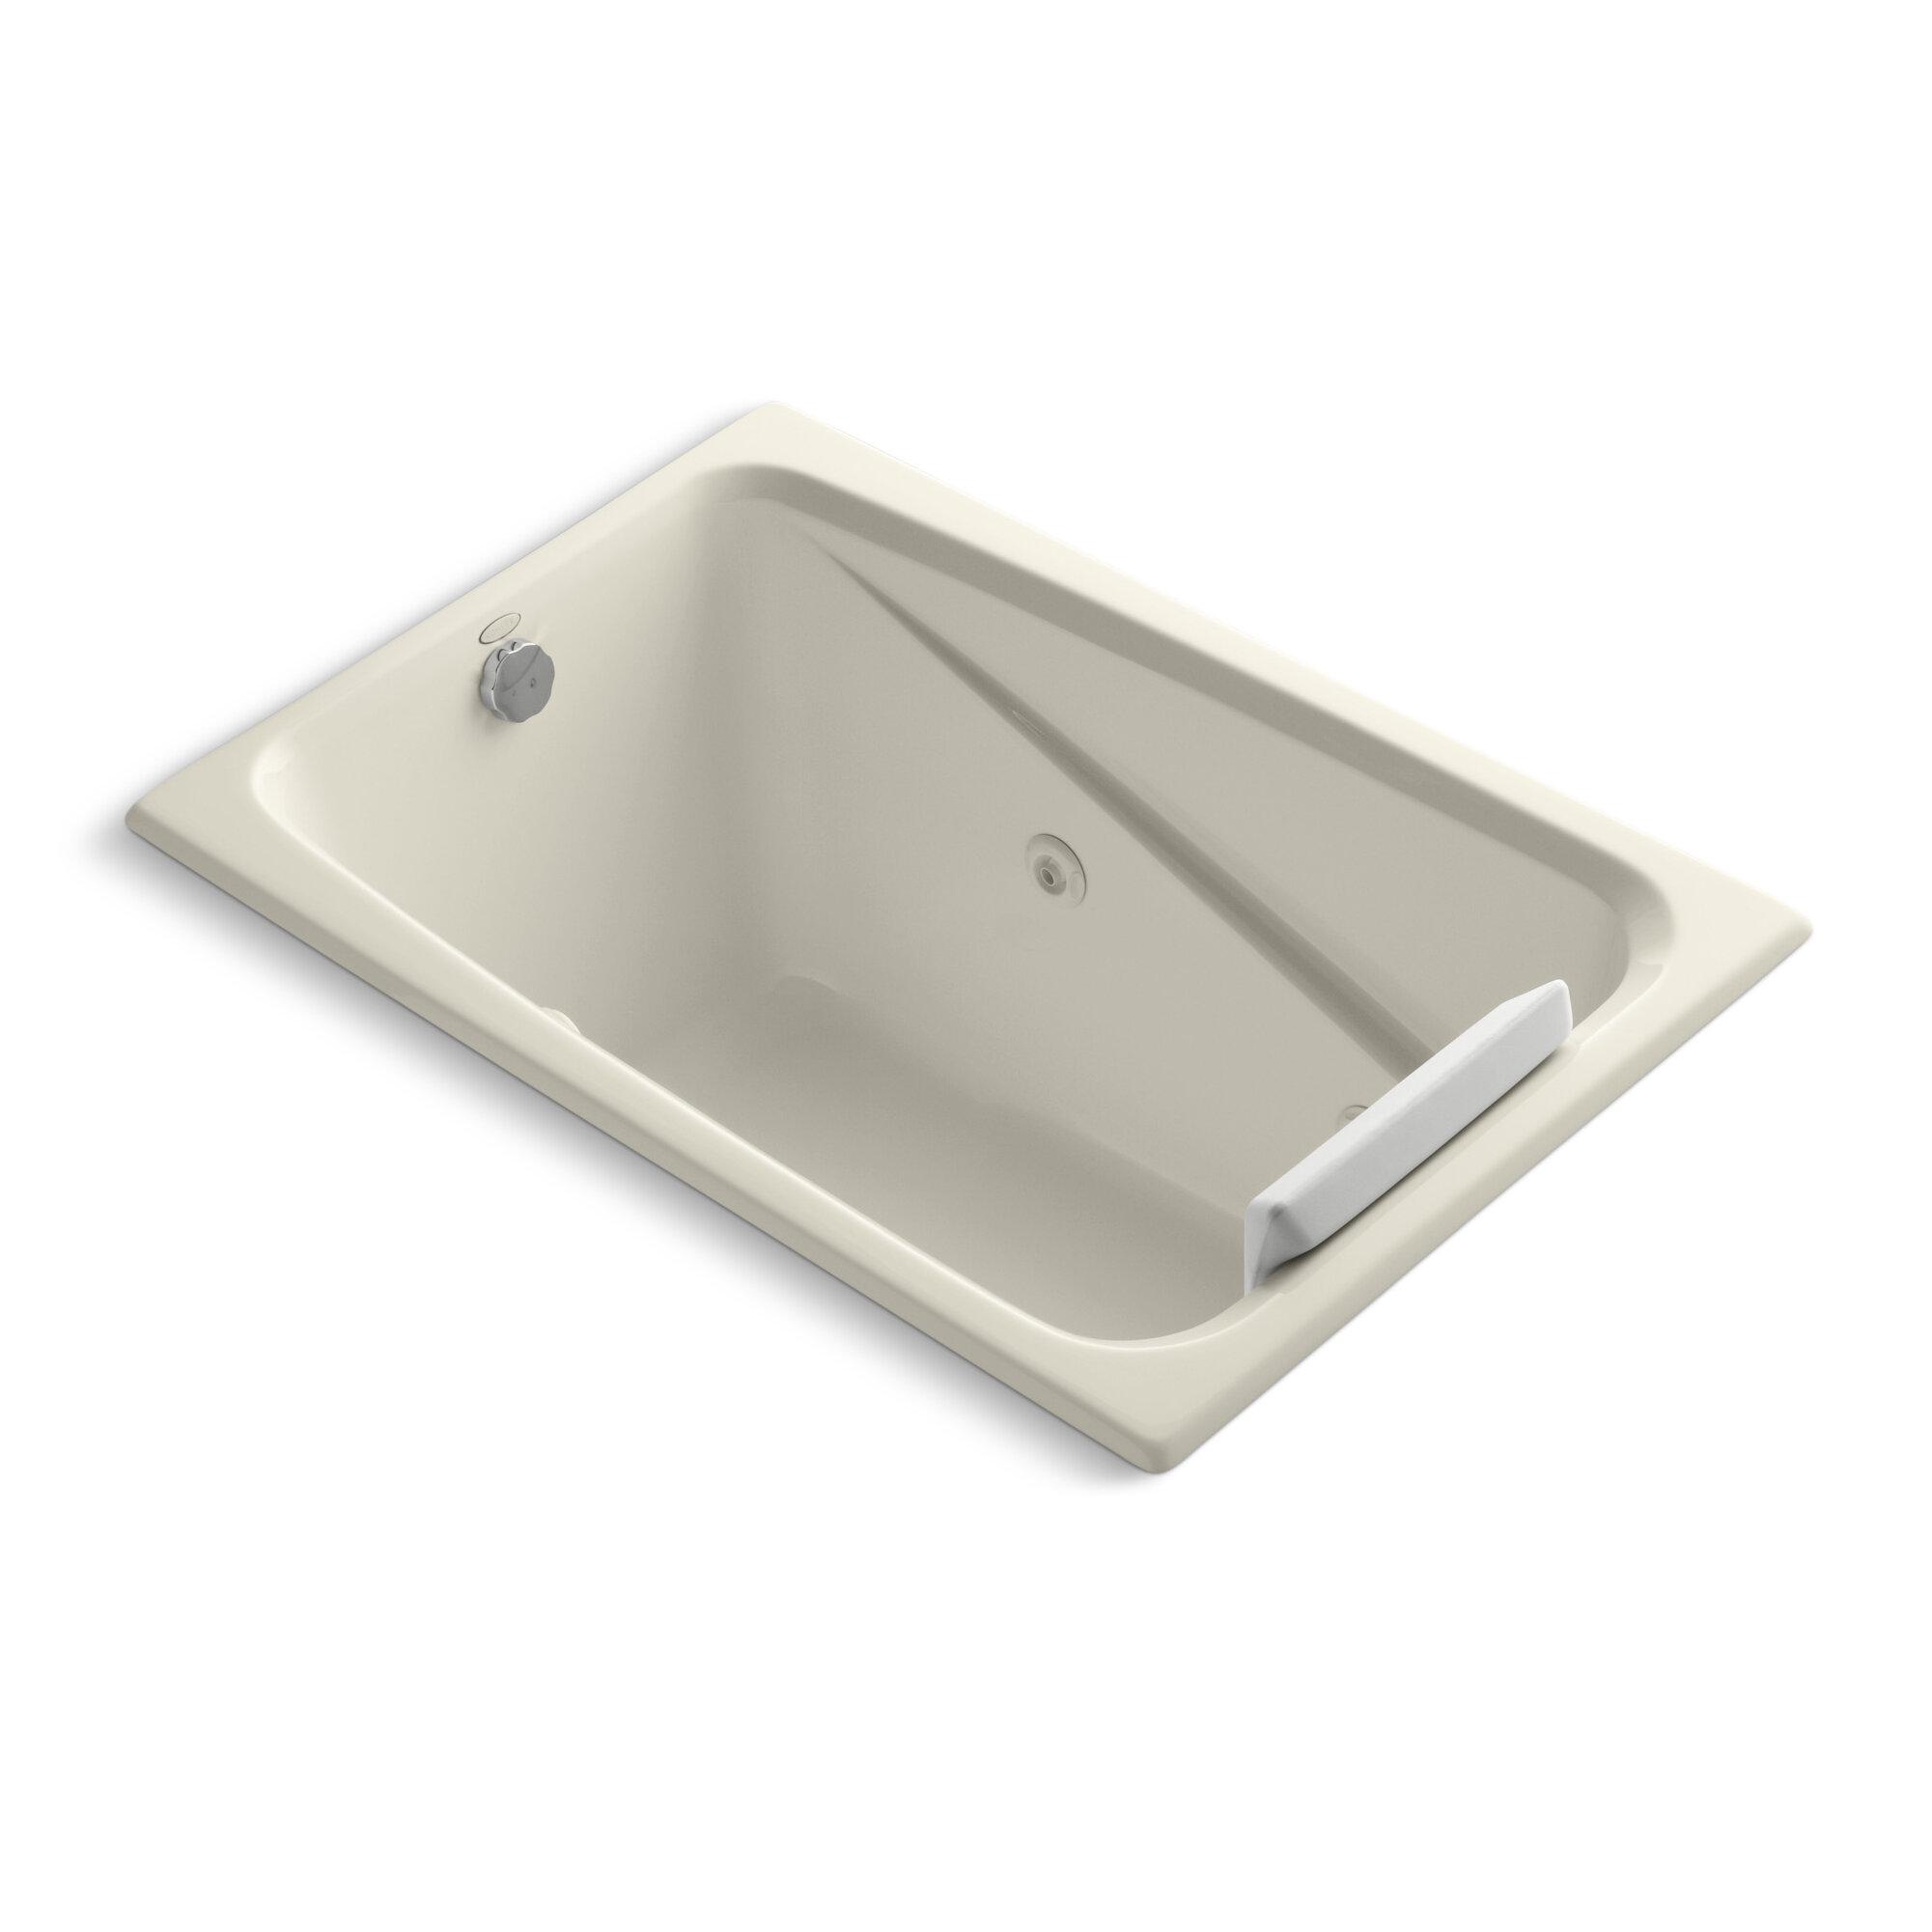 Greek 48 X 32 Whirlpool Bathtub